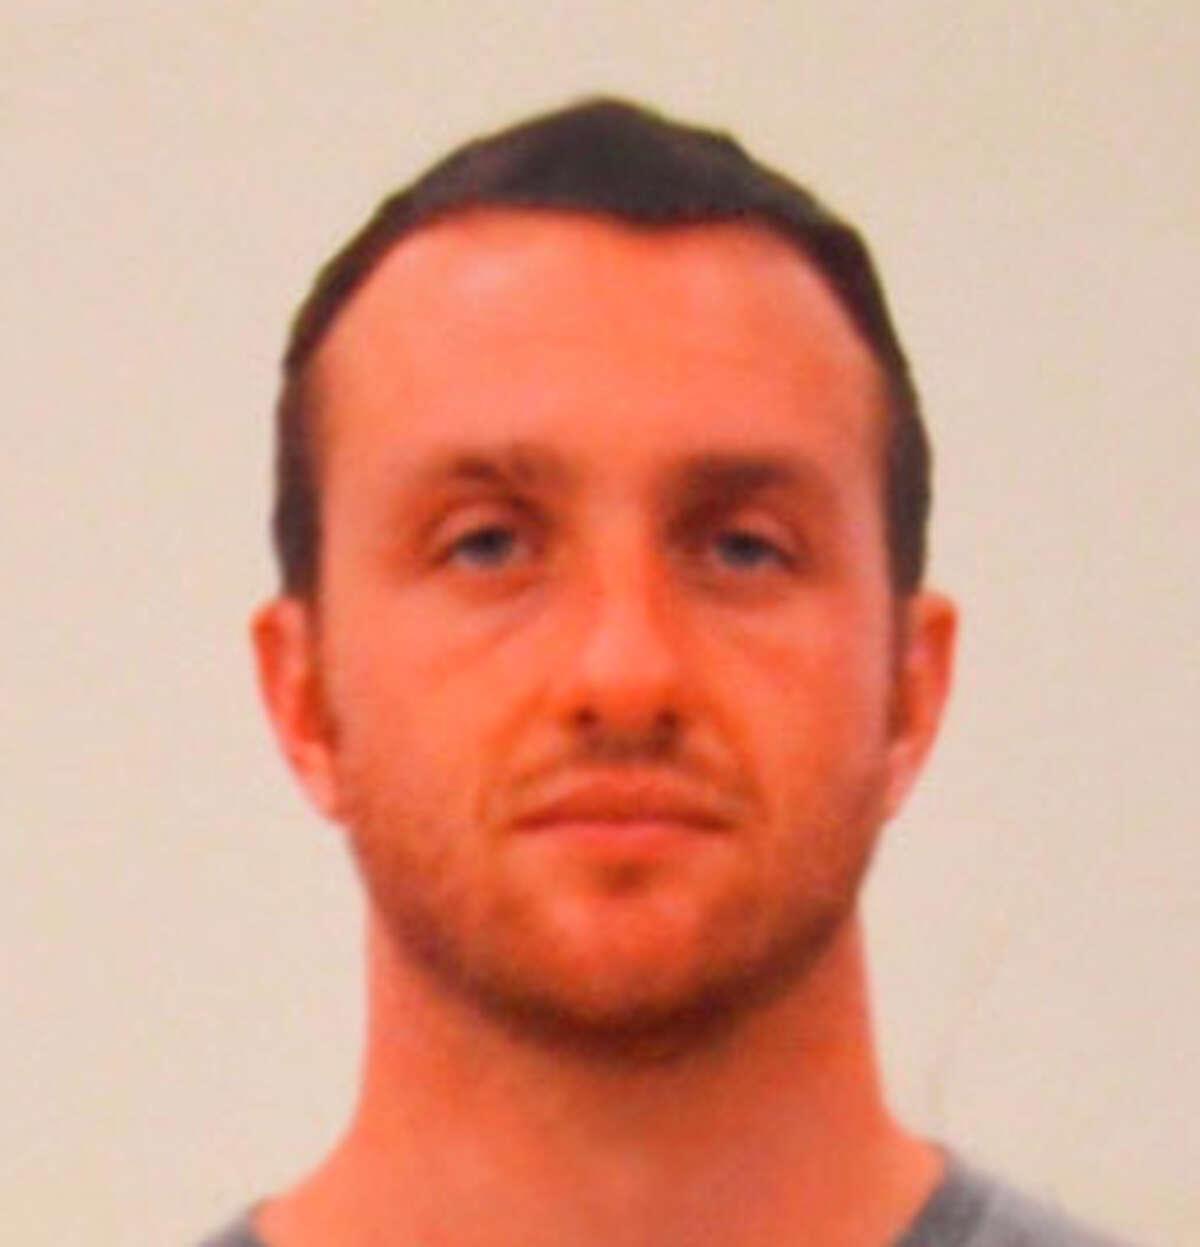 Houston Fire Department Cadet Steven Whitfield II, 32